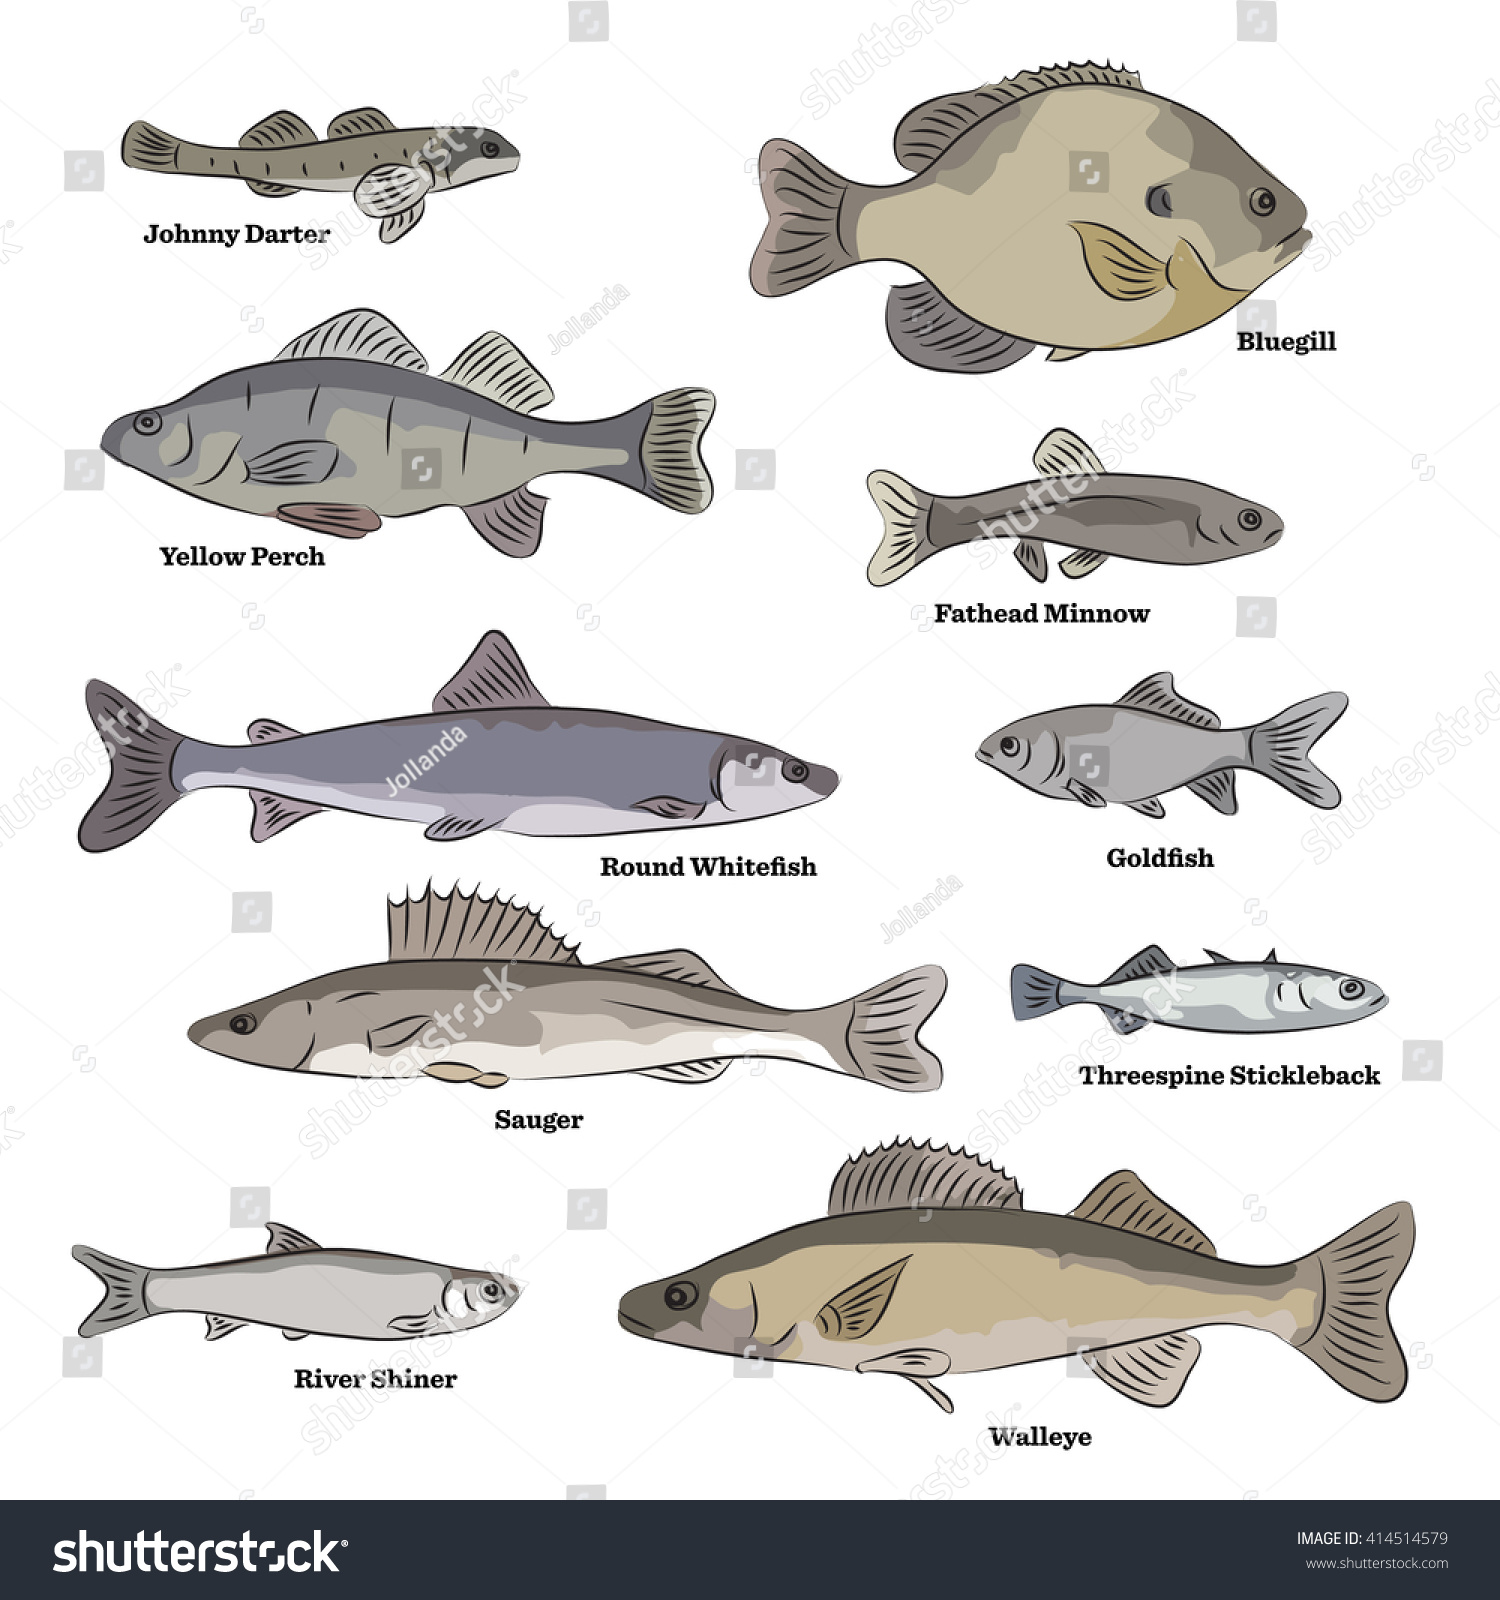 Freshwater fish dace - Freshwater Fish Illustrations Logperch Shiner Pumpkin Seed Lamprey Dace Quillback